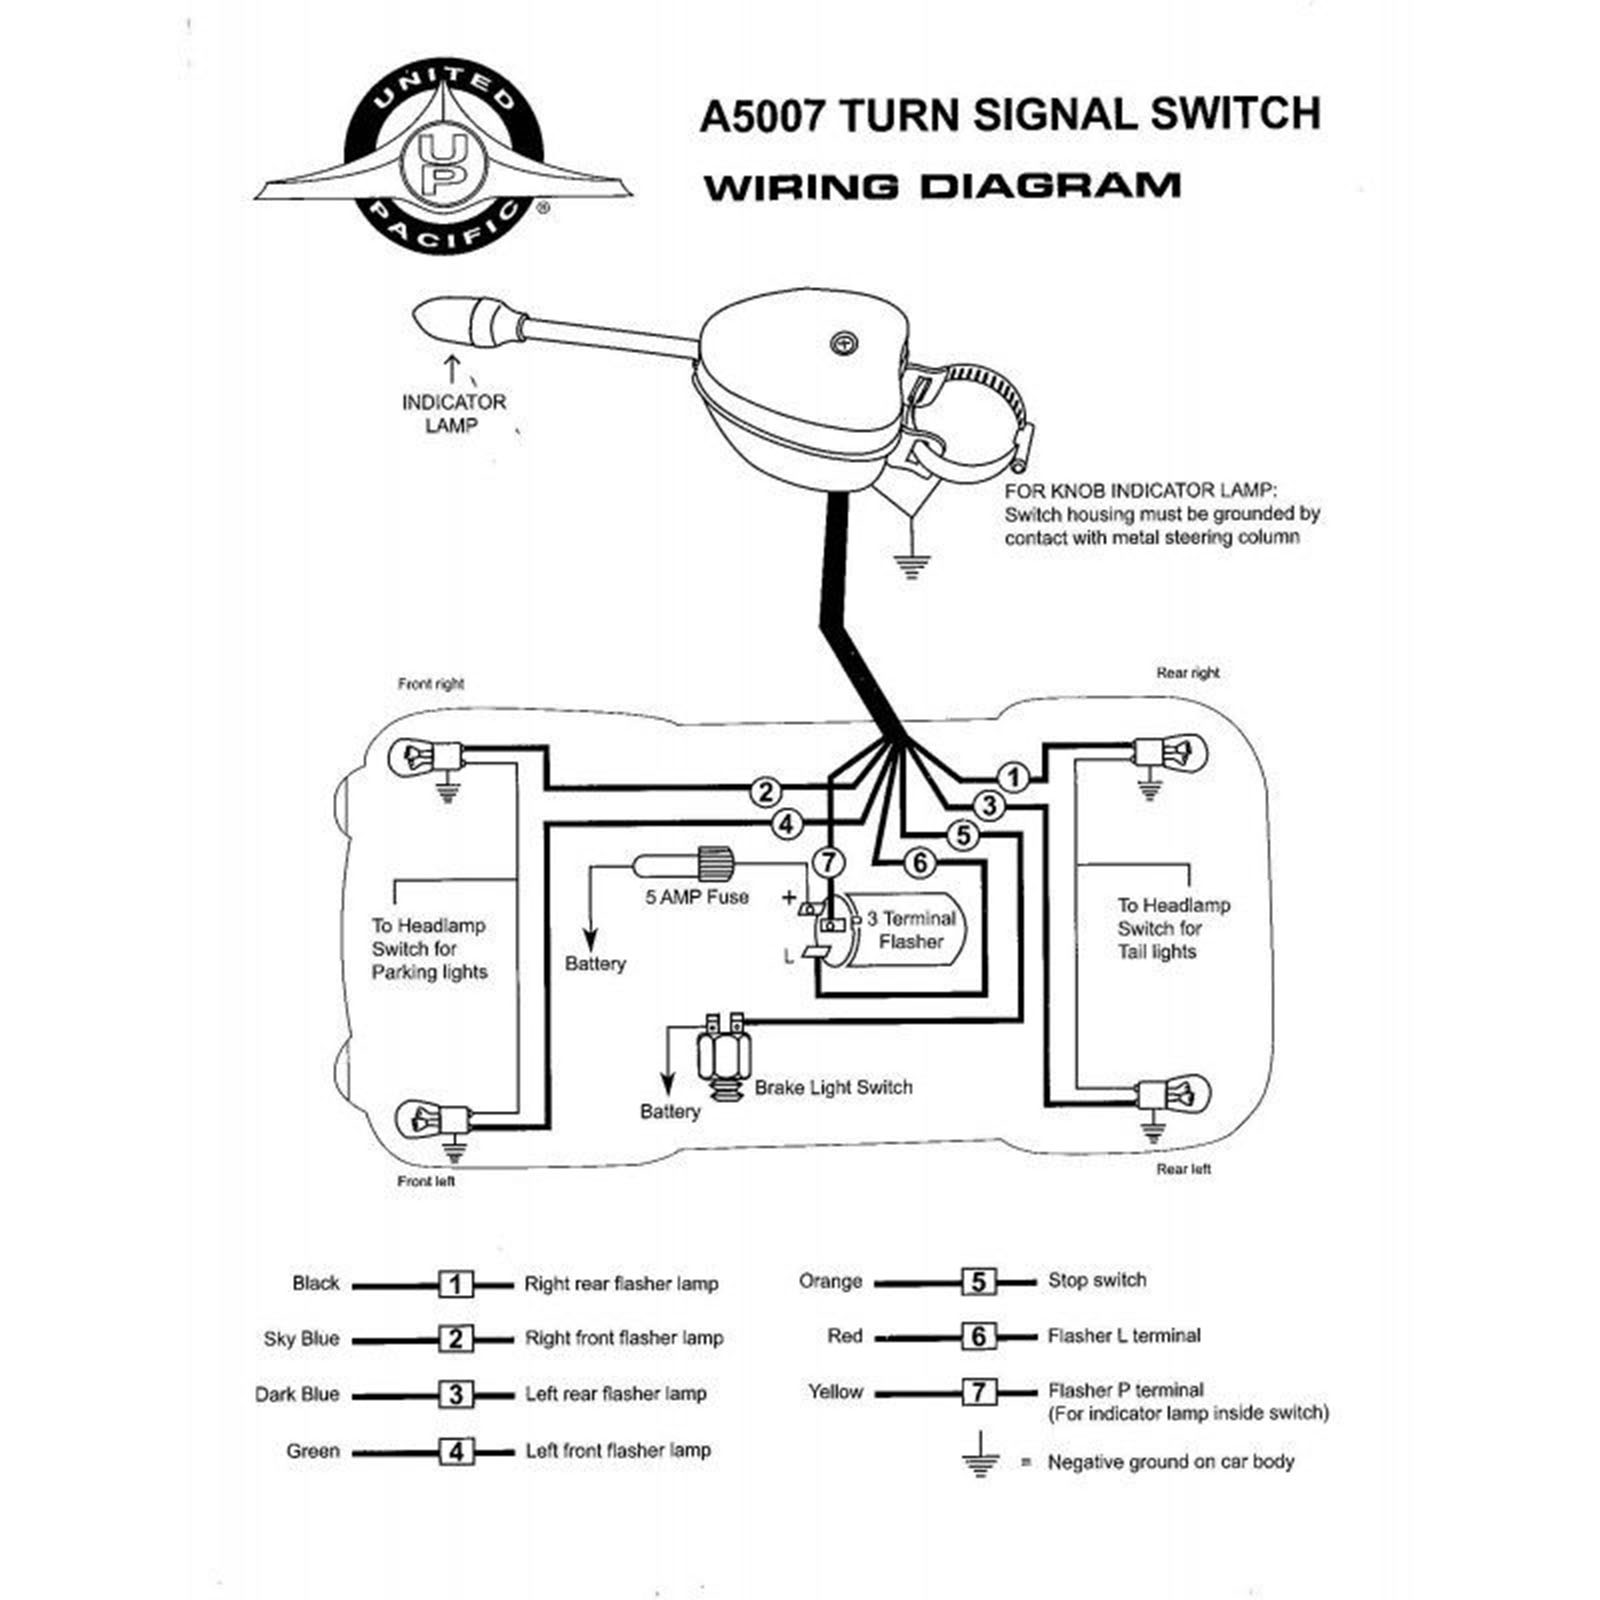 hight resolution of wrg 1635 hot rod brake light wiring diagram12 volt chrome steel turn signal flasher switch